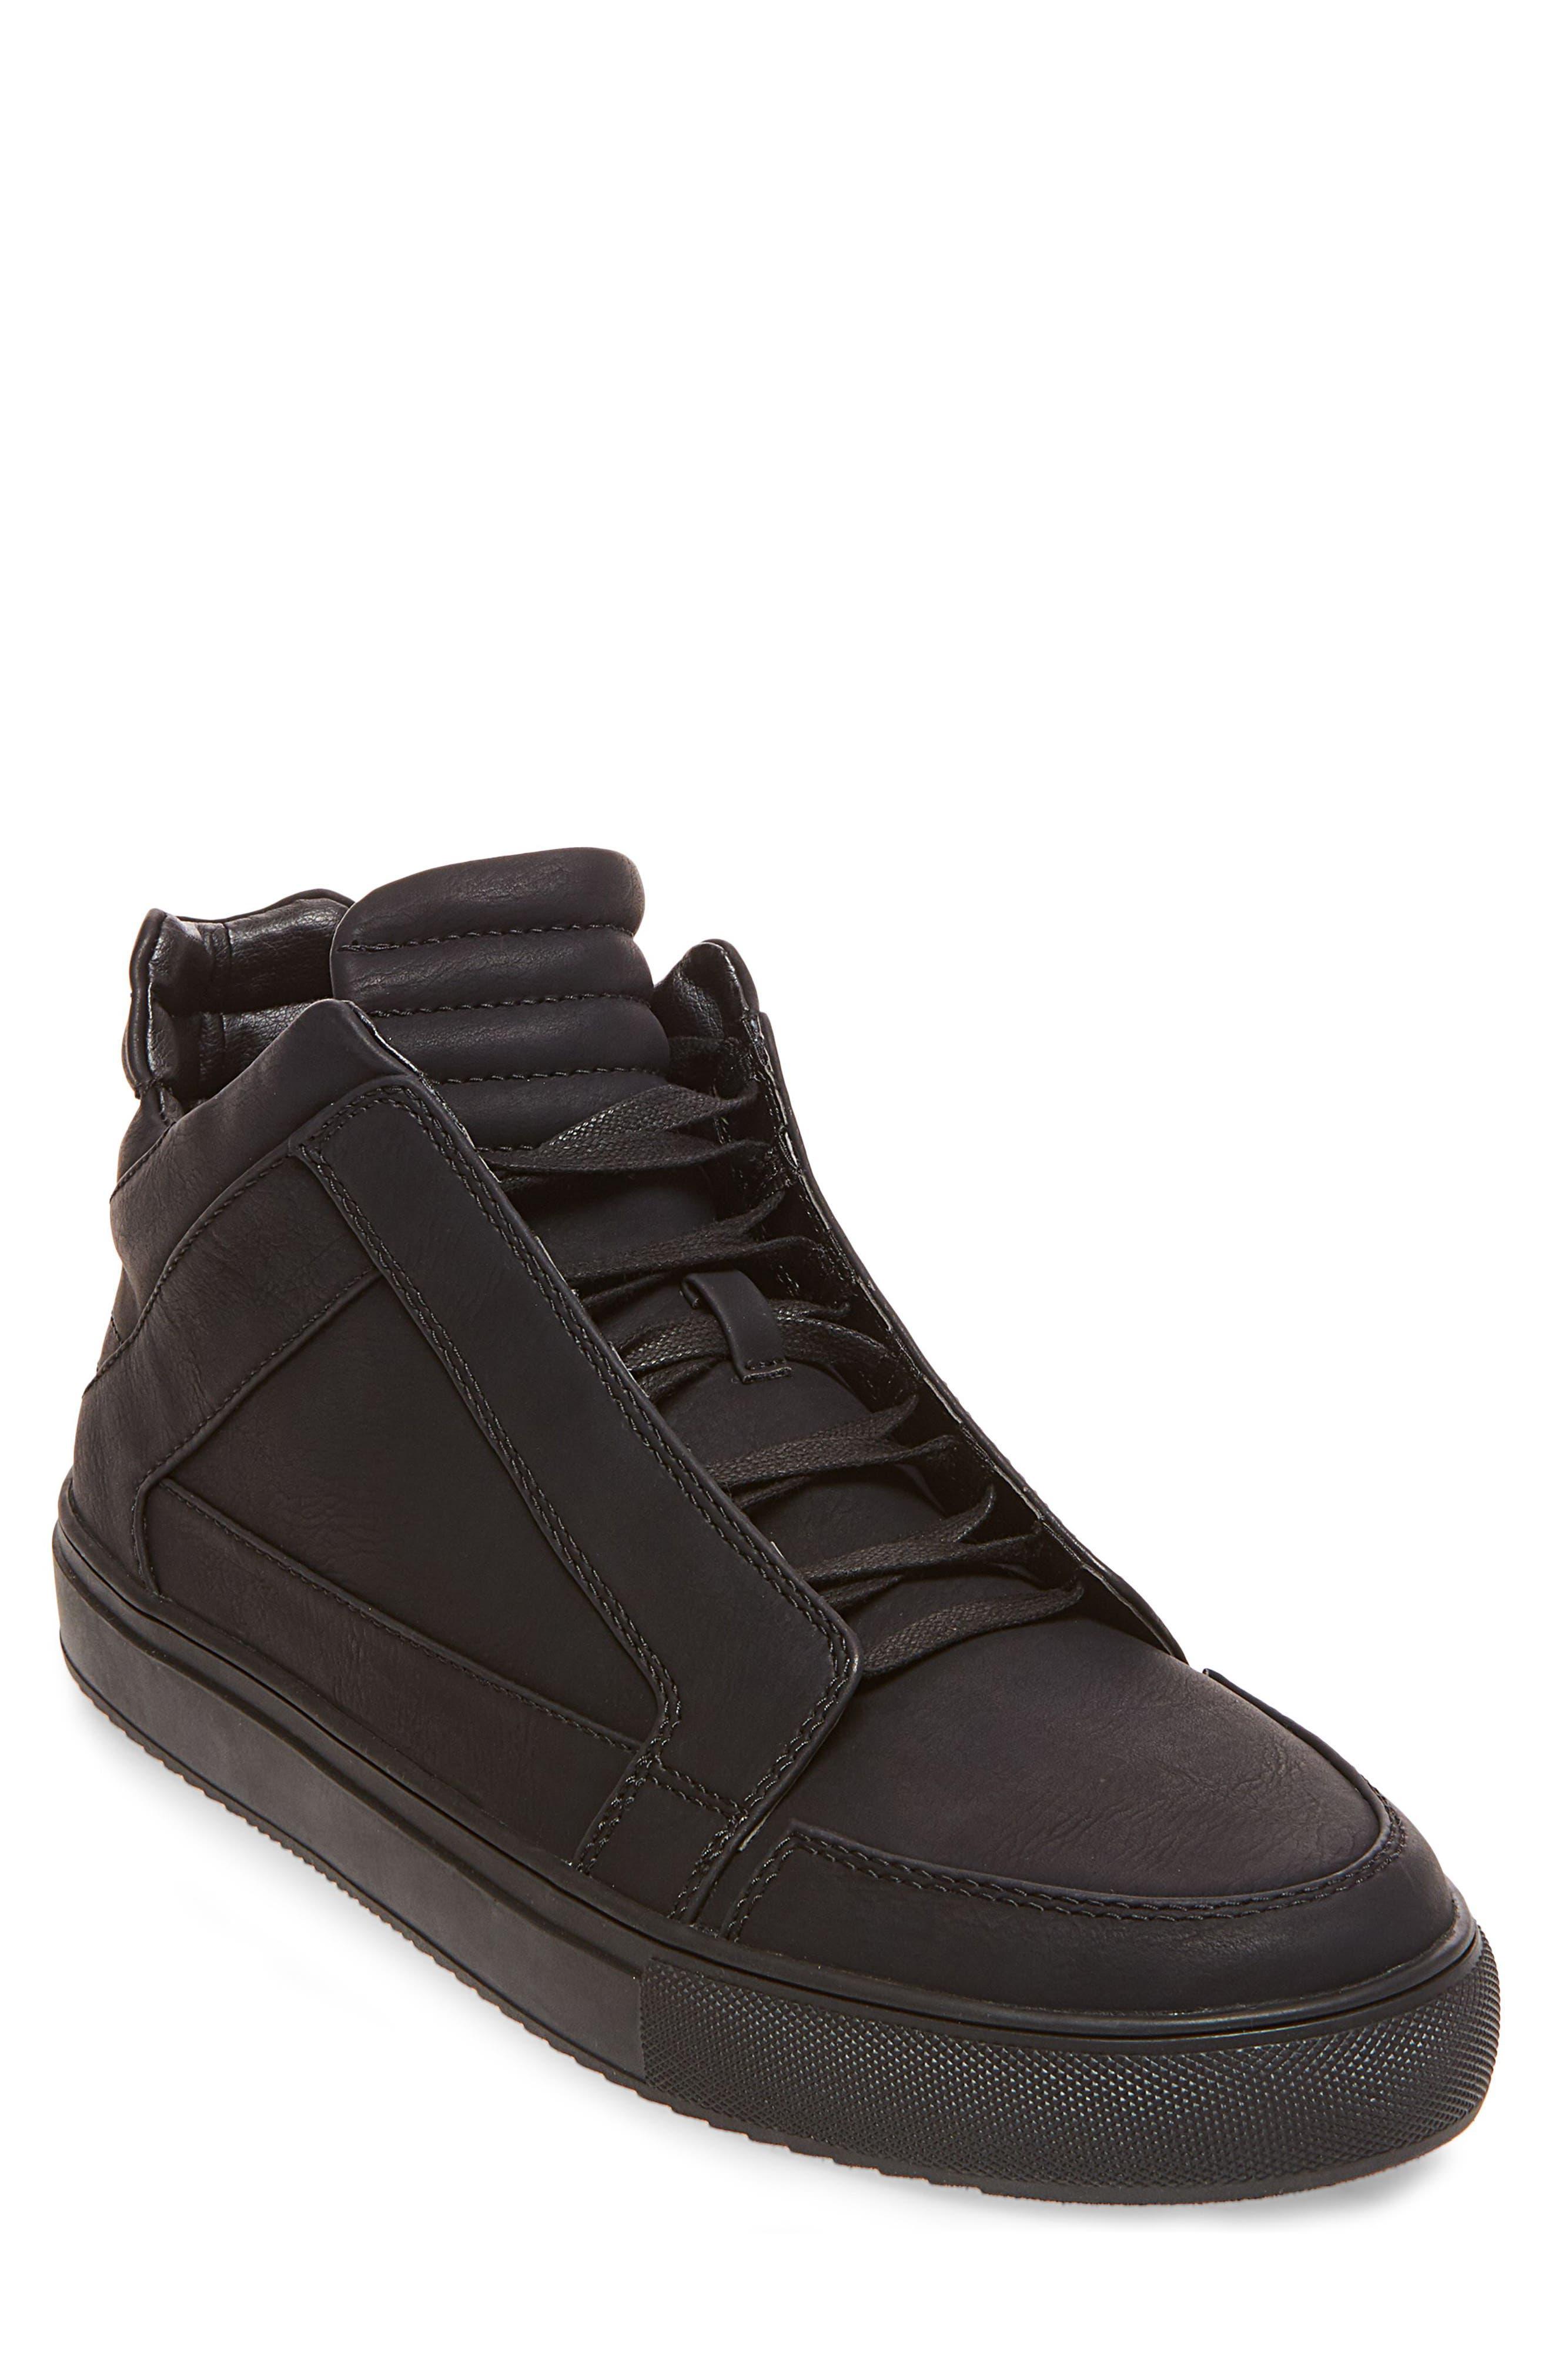 Defstar Sneaker,                         Main,                         color, Black